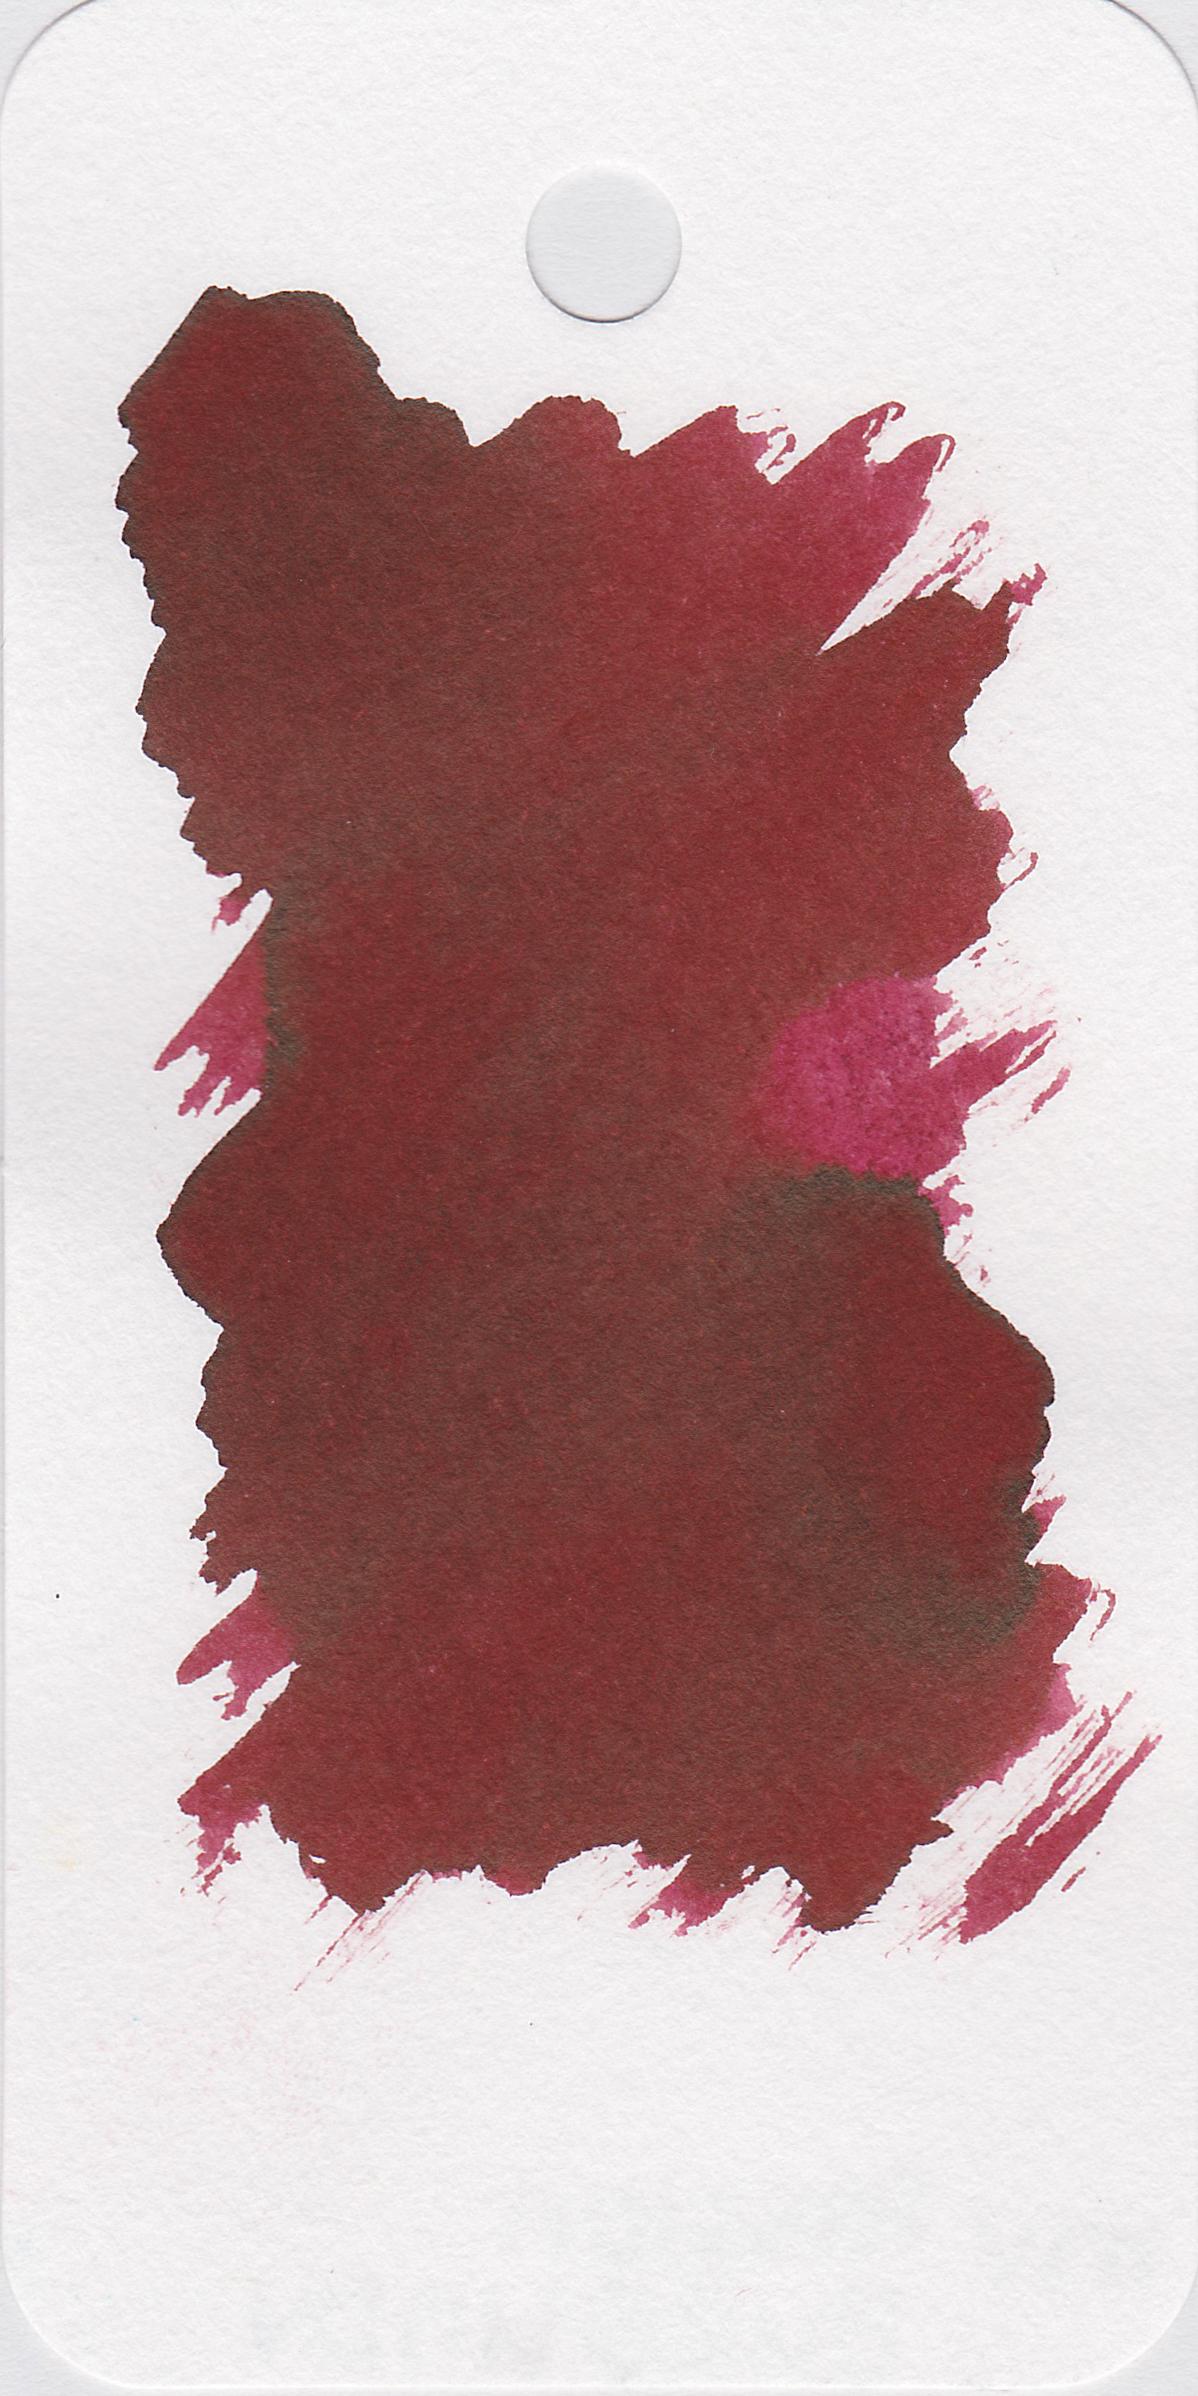 ro-burgundy-2.jpg